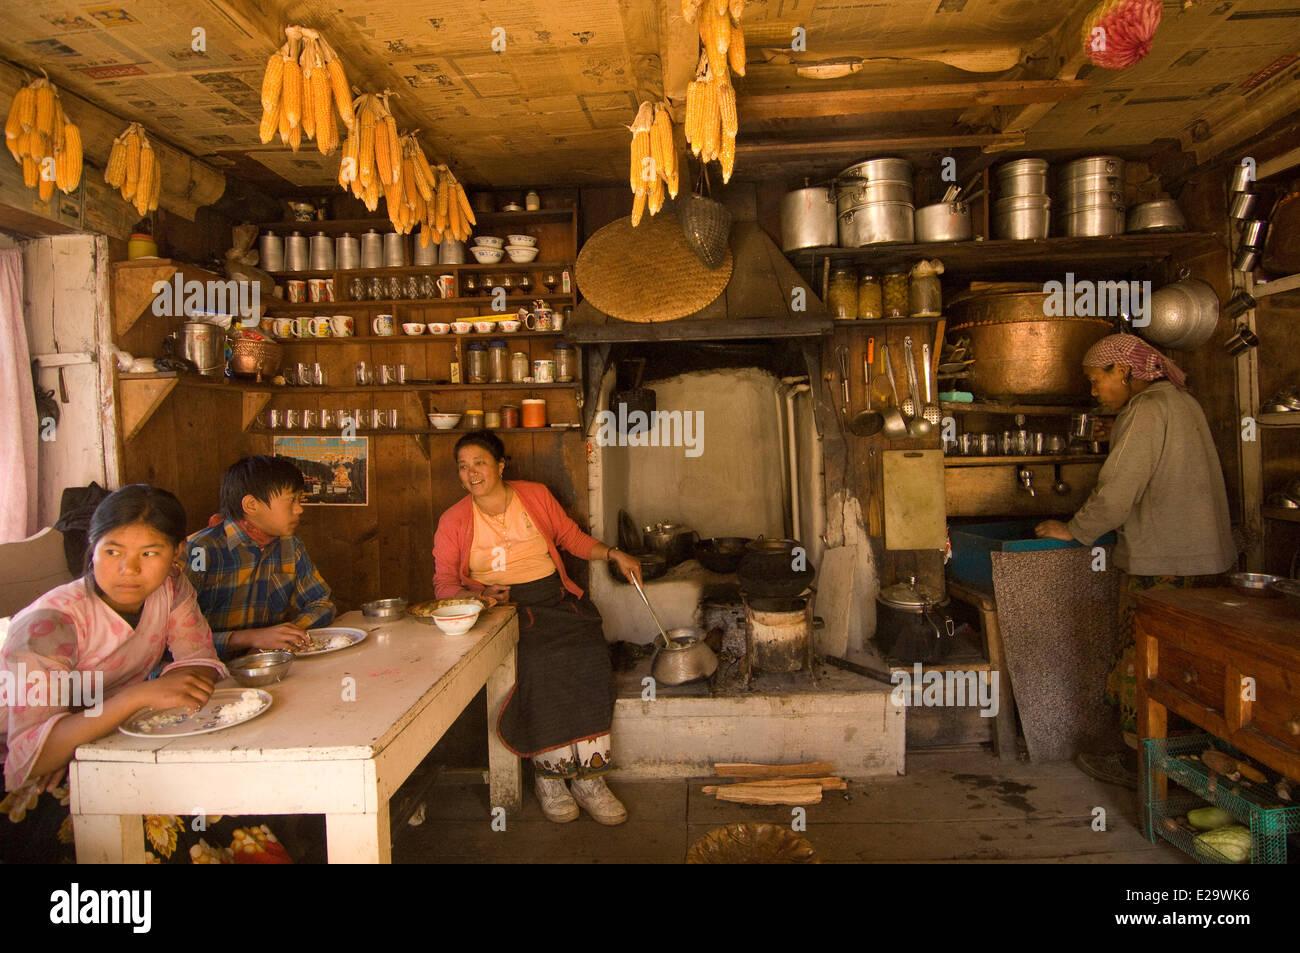 Nepal, Sagarmatha Zone, Khumbu Region, trek of the Everest Base Camp, Bupsa, lunch time in a sherpa house - Stock Image